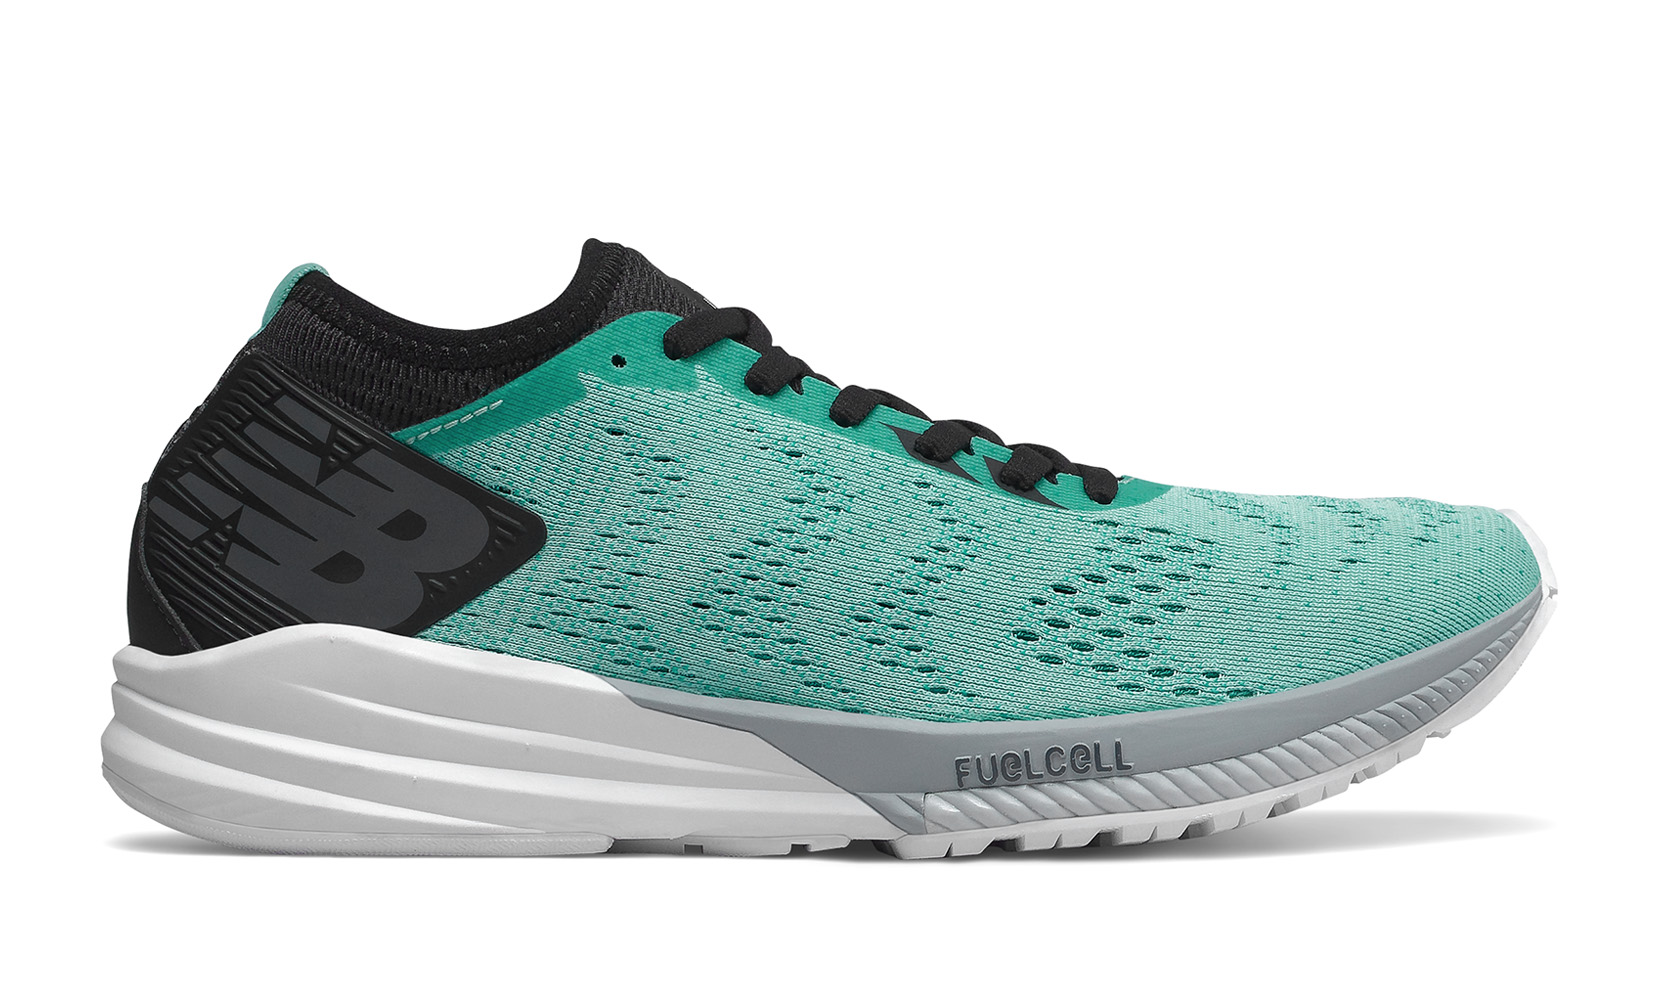 Жіноче взуття для бігу New Balance Fuel Cell Impulse WFCIMTB | New Balance